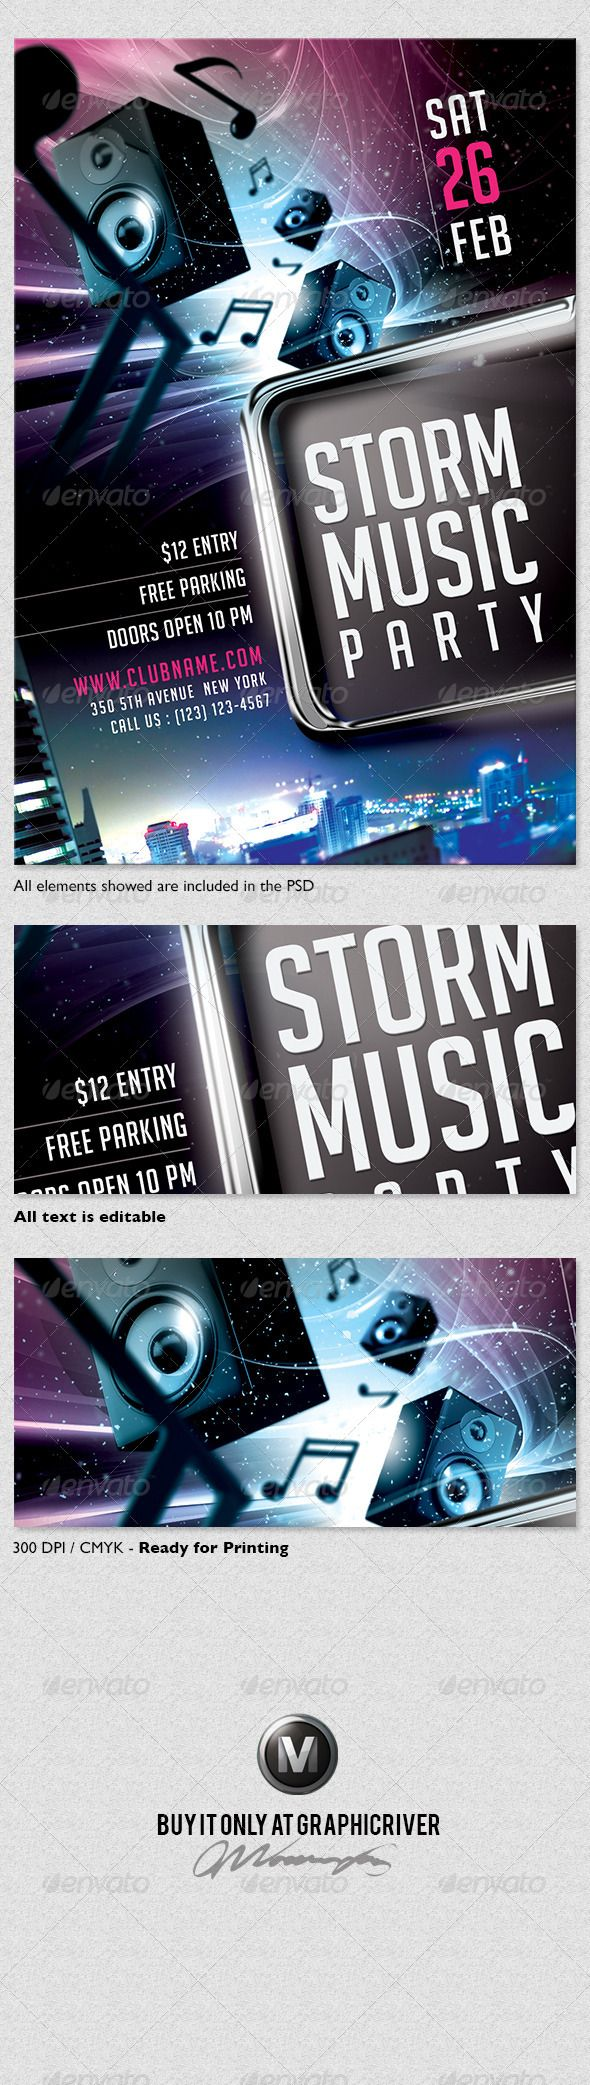 Storm Music Flyer Template